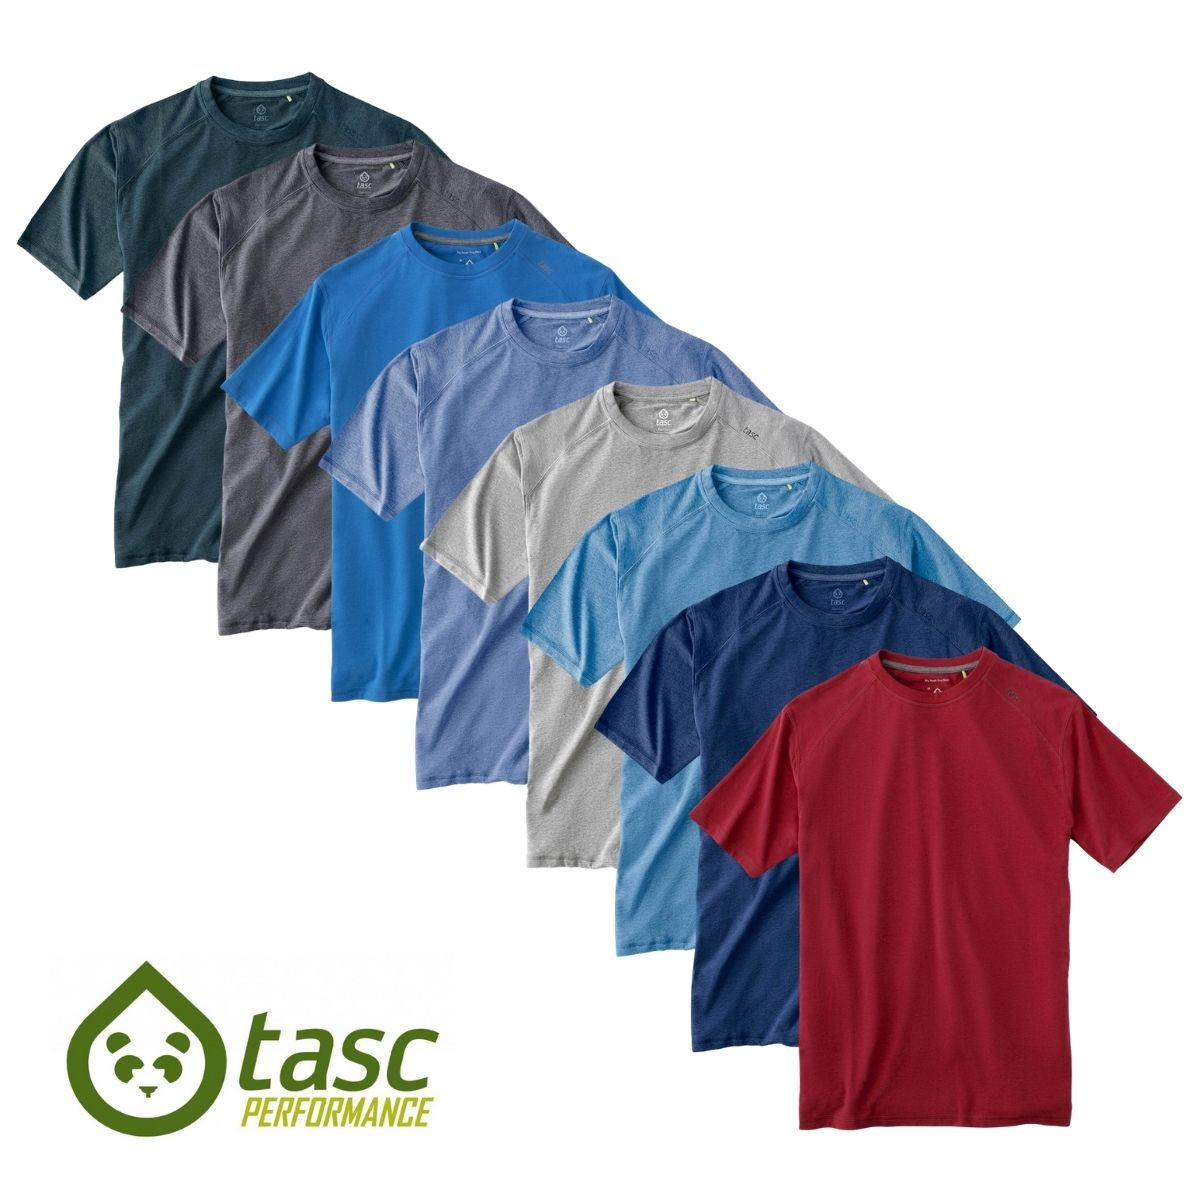 Tasc Men's 2021 Carrollton T-Shirt